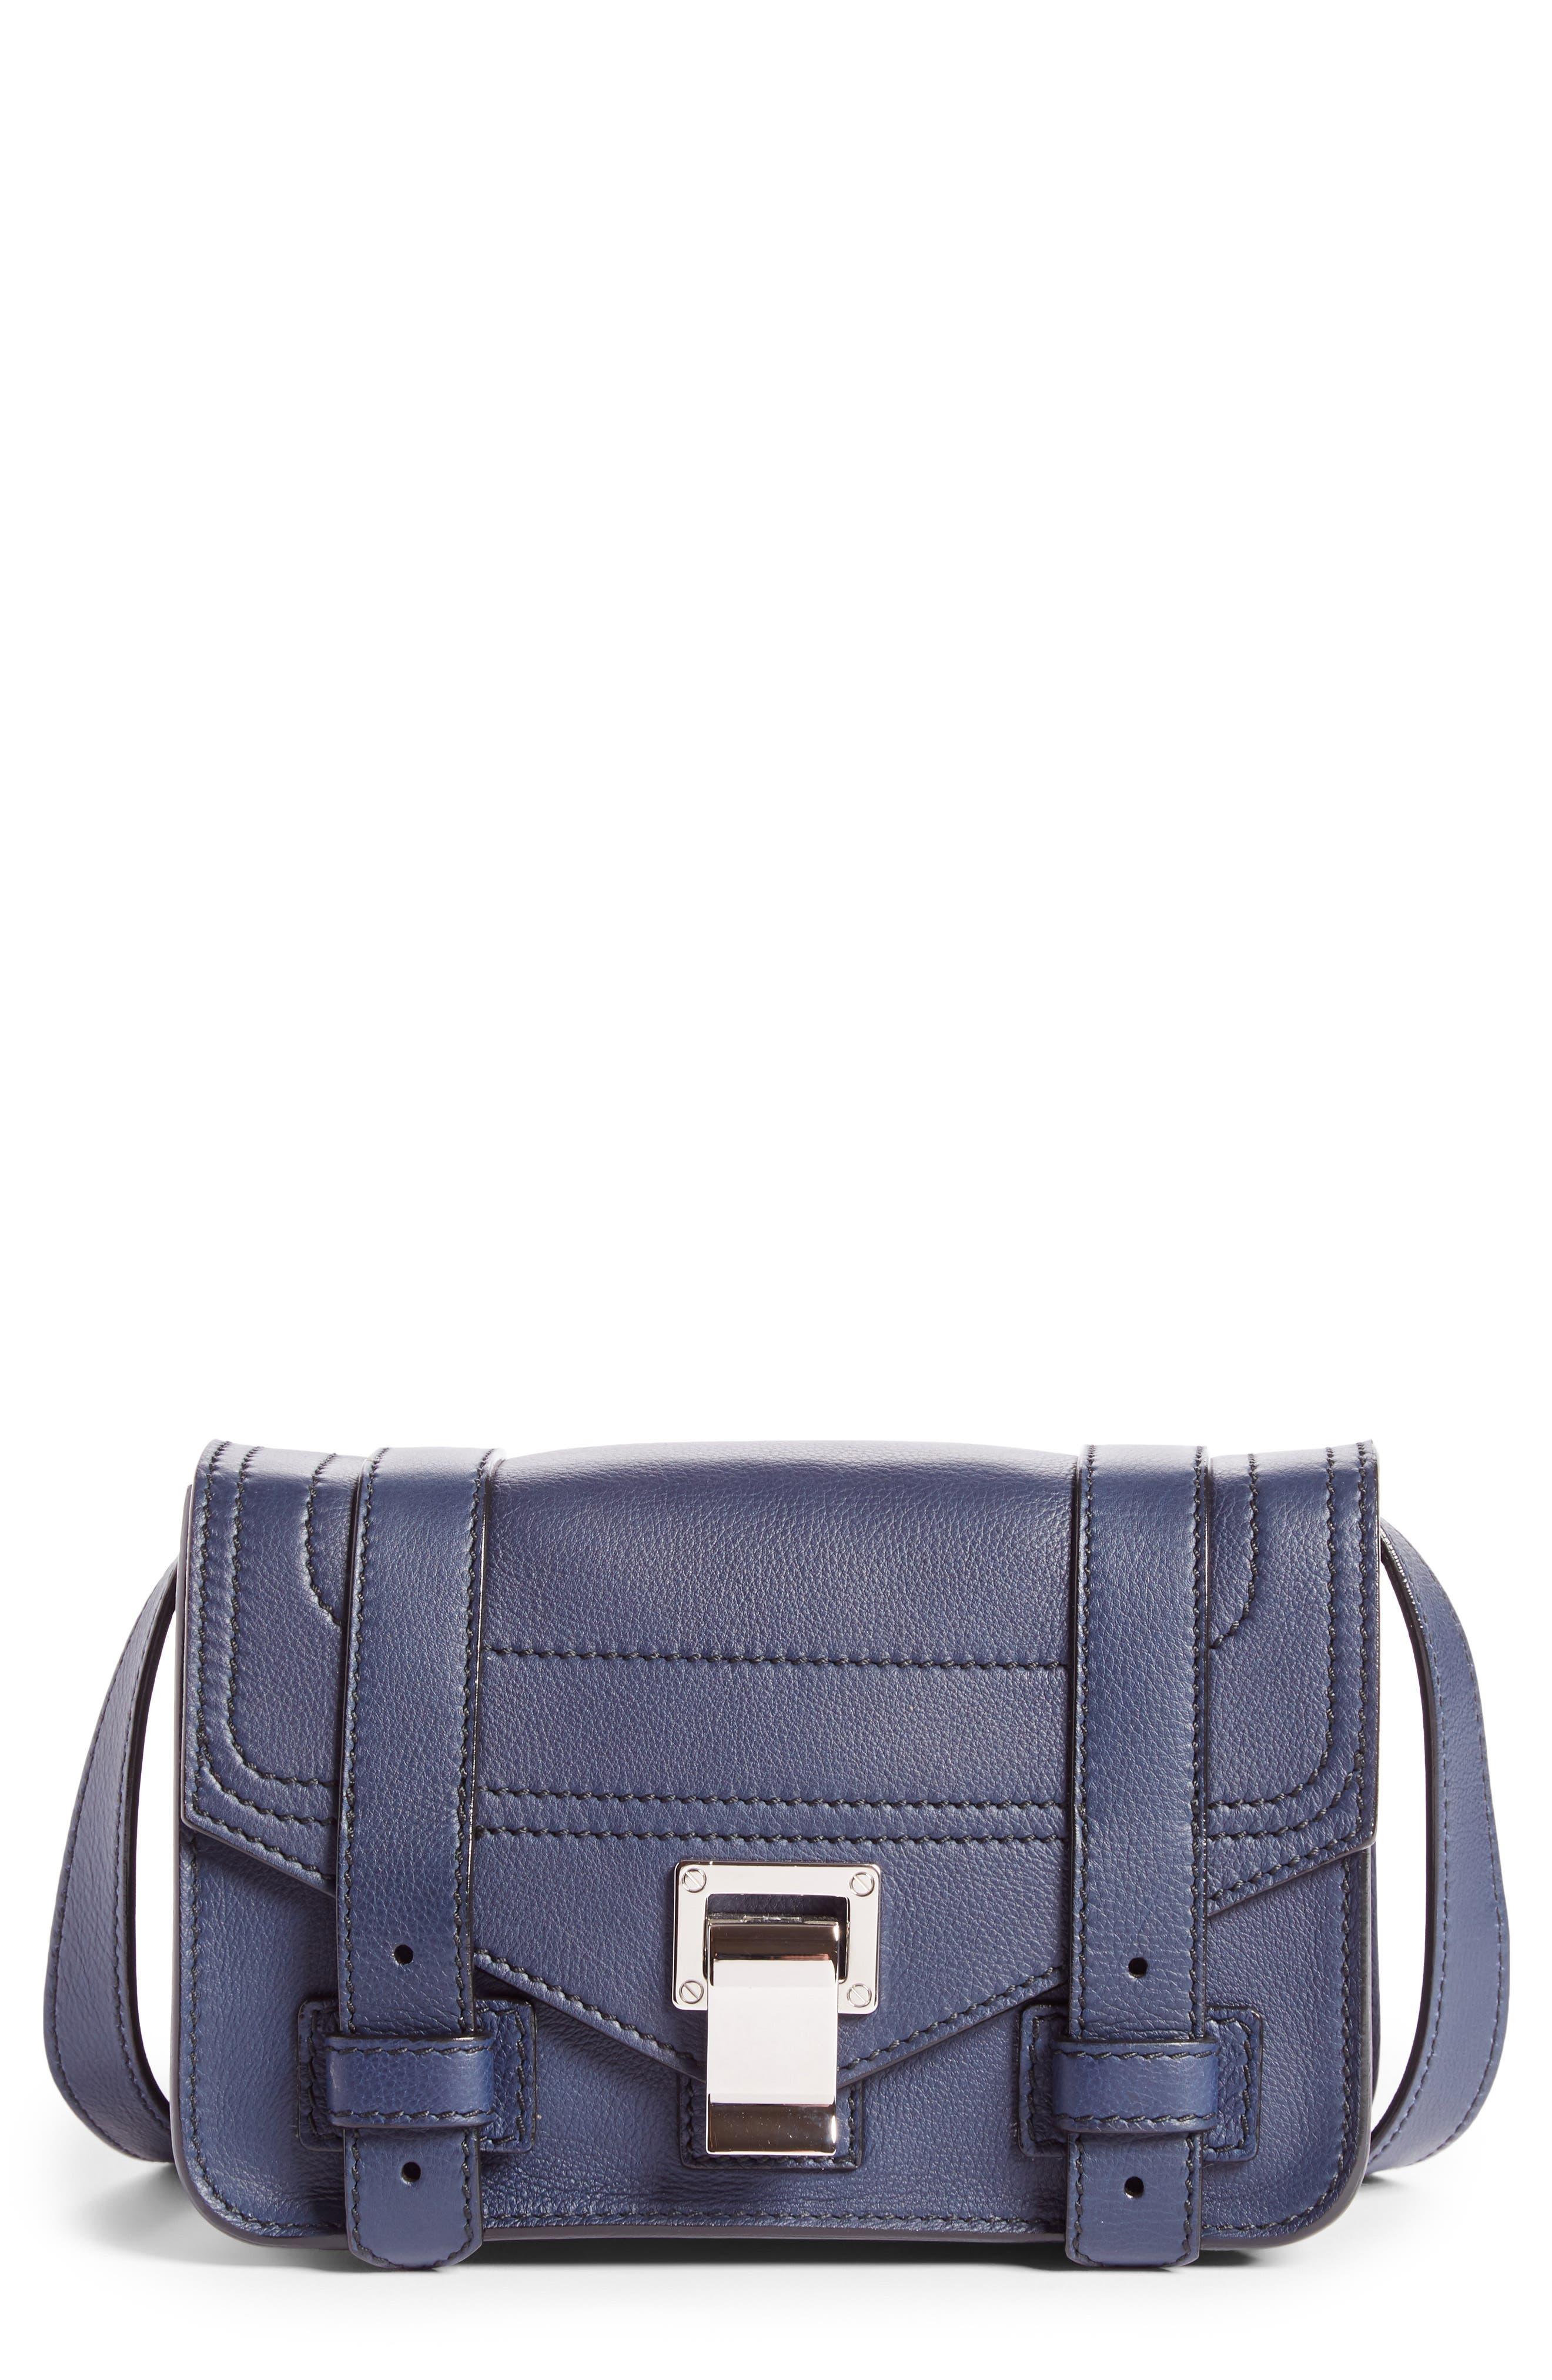 Proenza Schouler Mini PS1 Leather Crossbody Bag